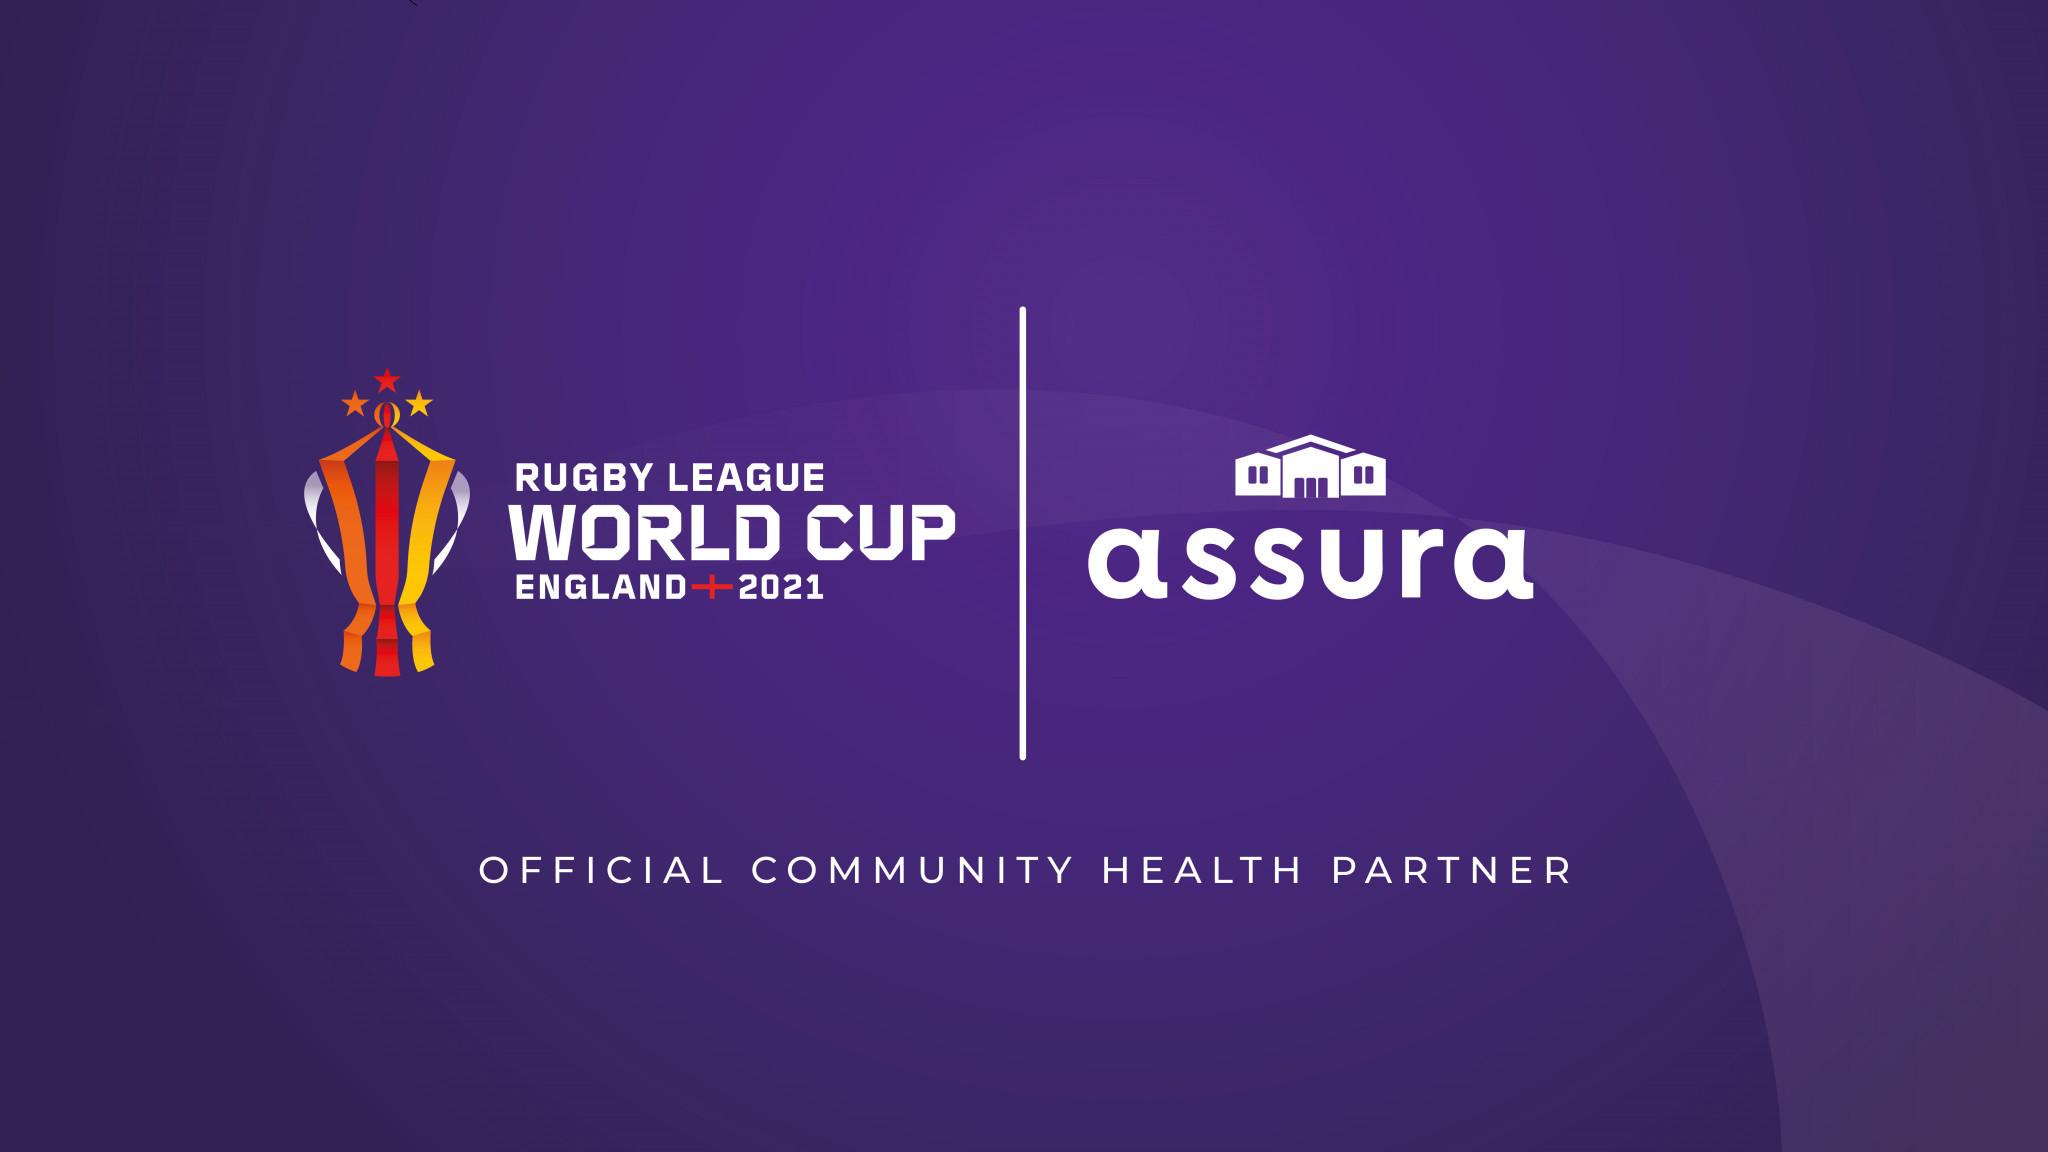 Rugby League World Cup 2021 announce Assura as community health partner